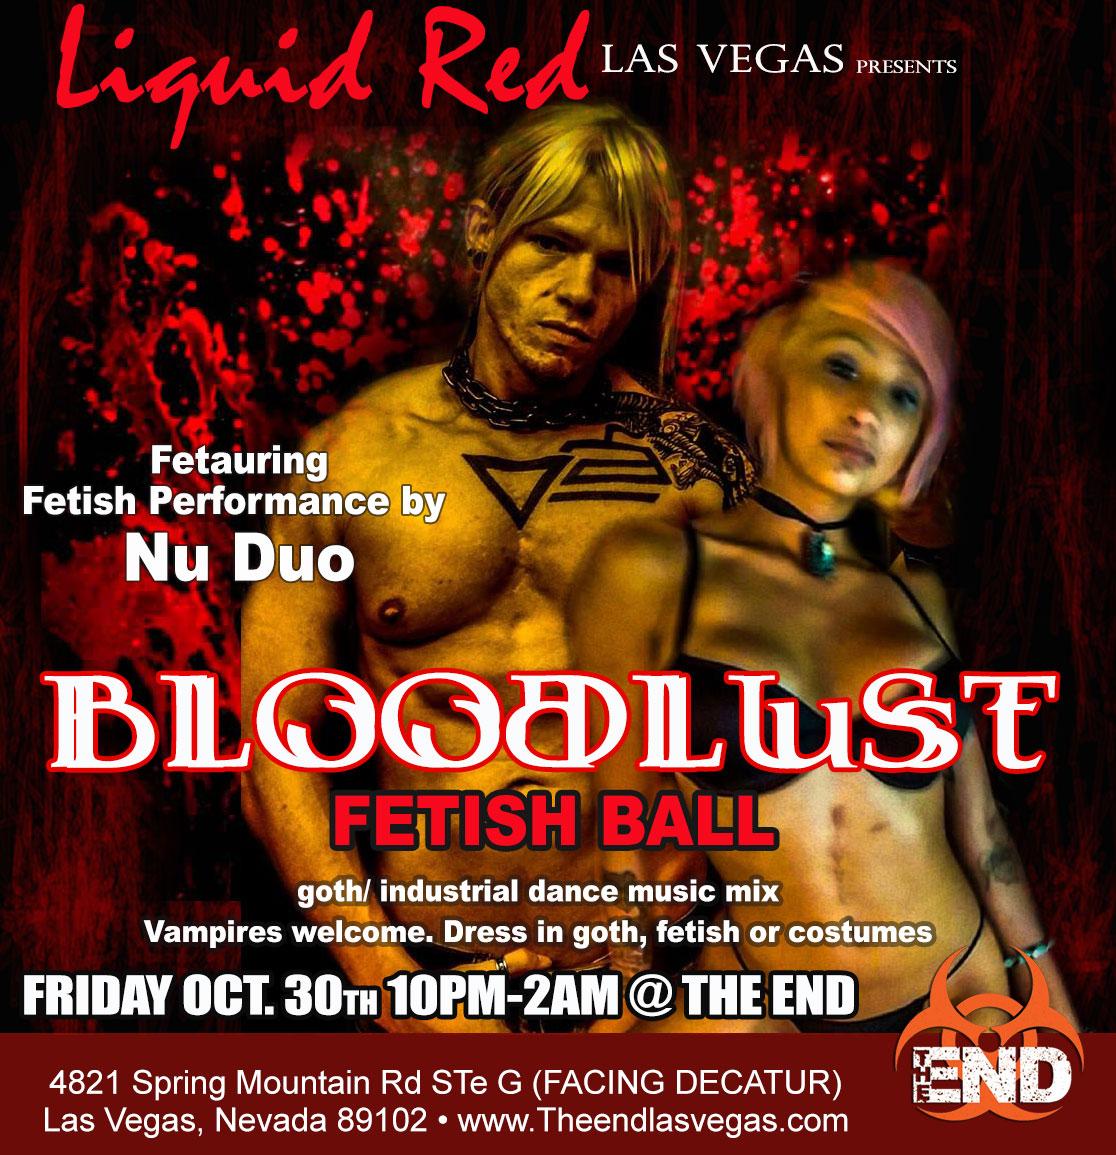 LiquidRed-oct-bloodlust